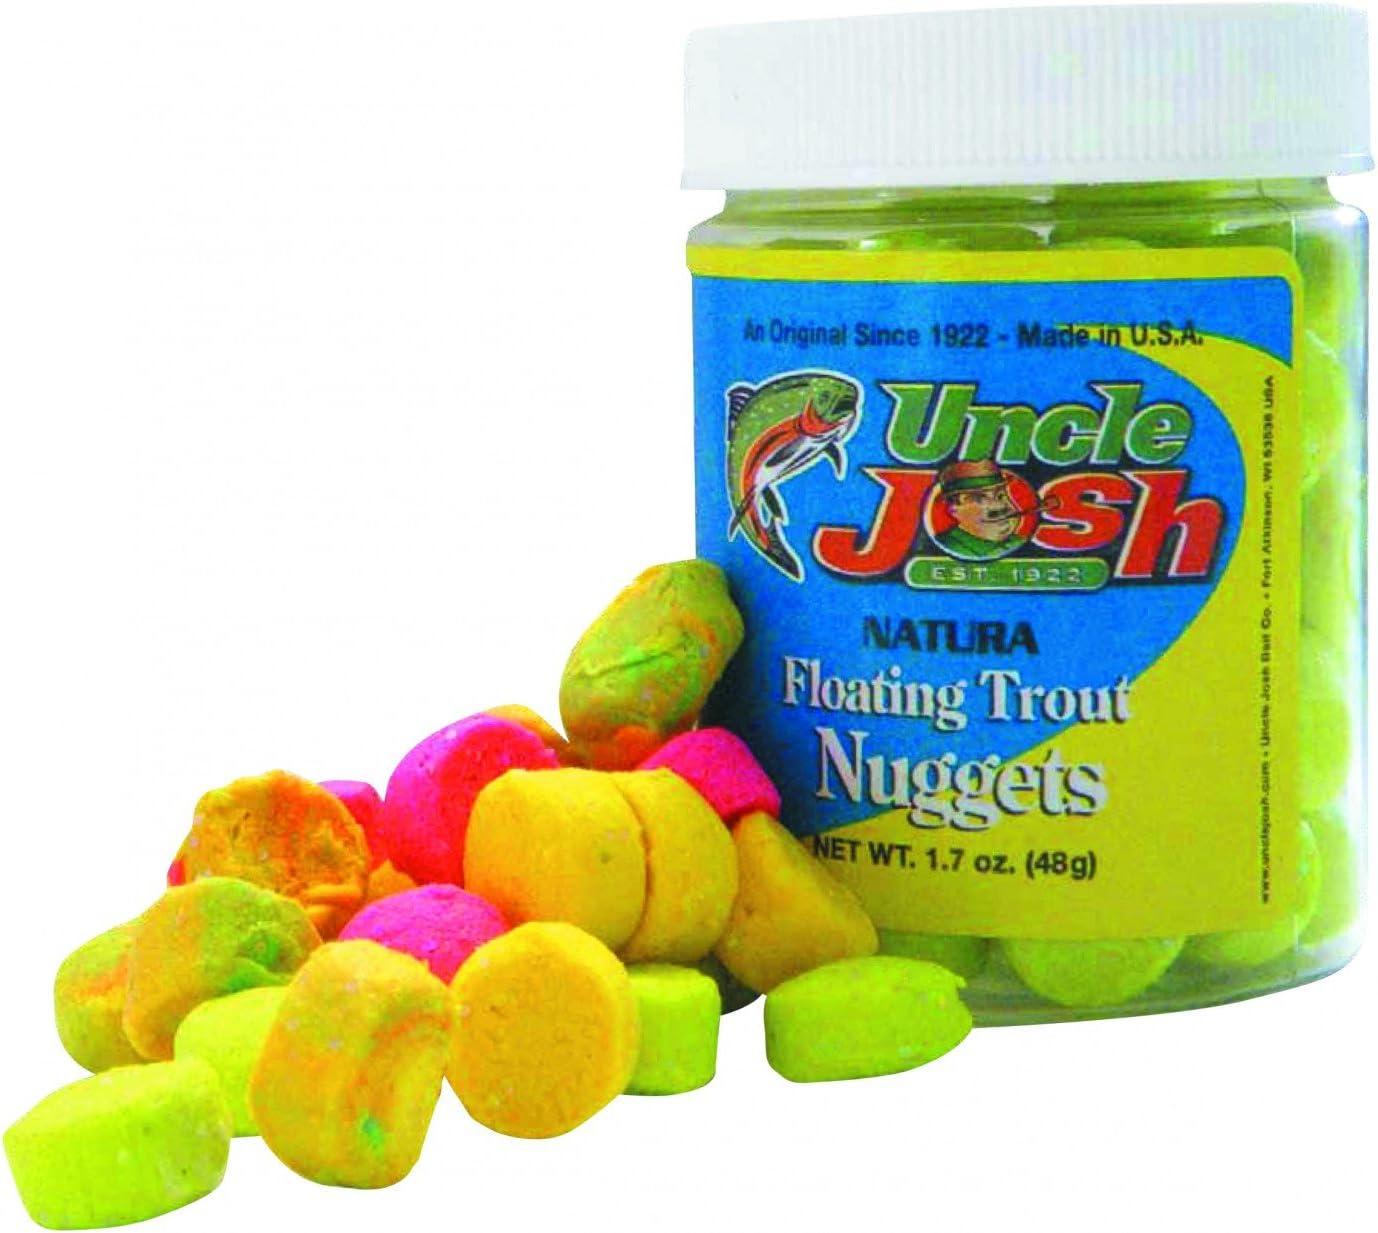 Uncle Josh Trout Nuggets 48g Forellenköder Regenbogen Glitter